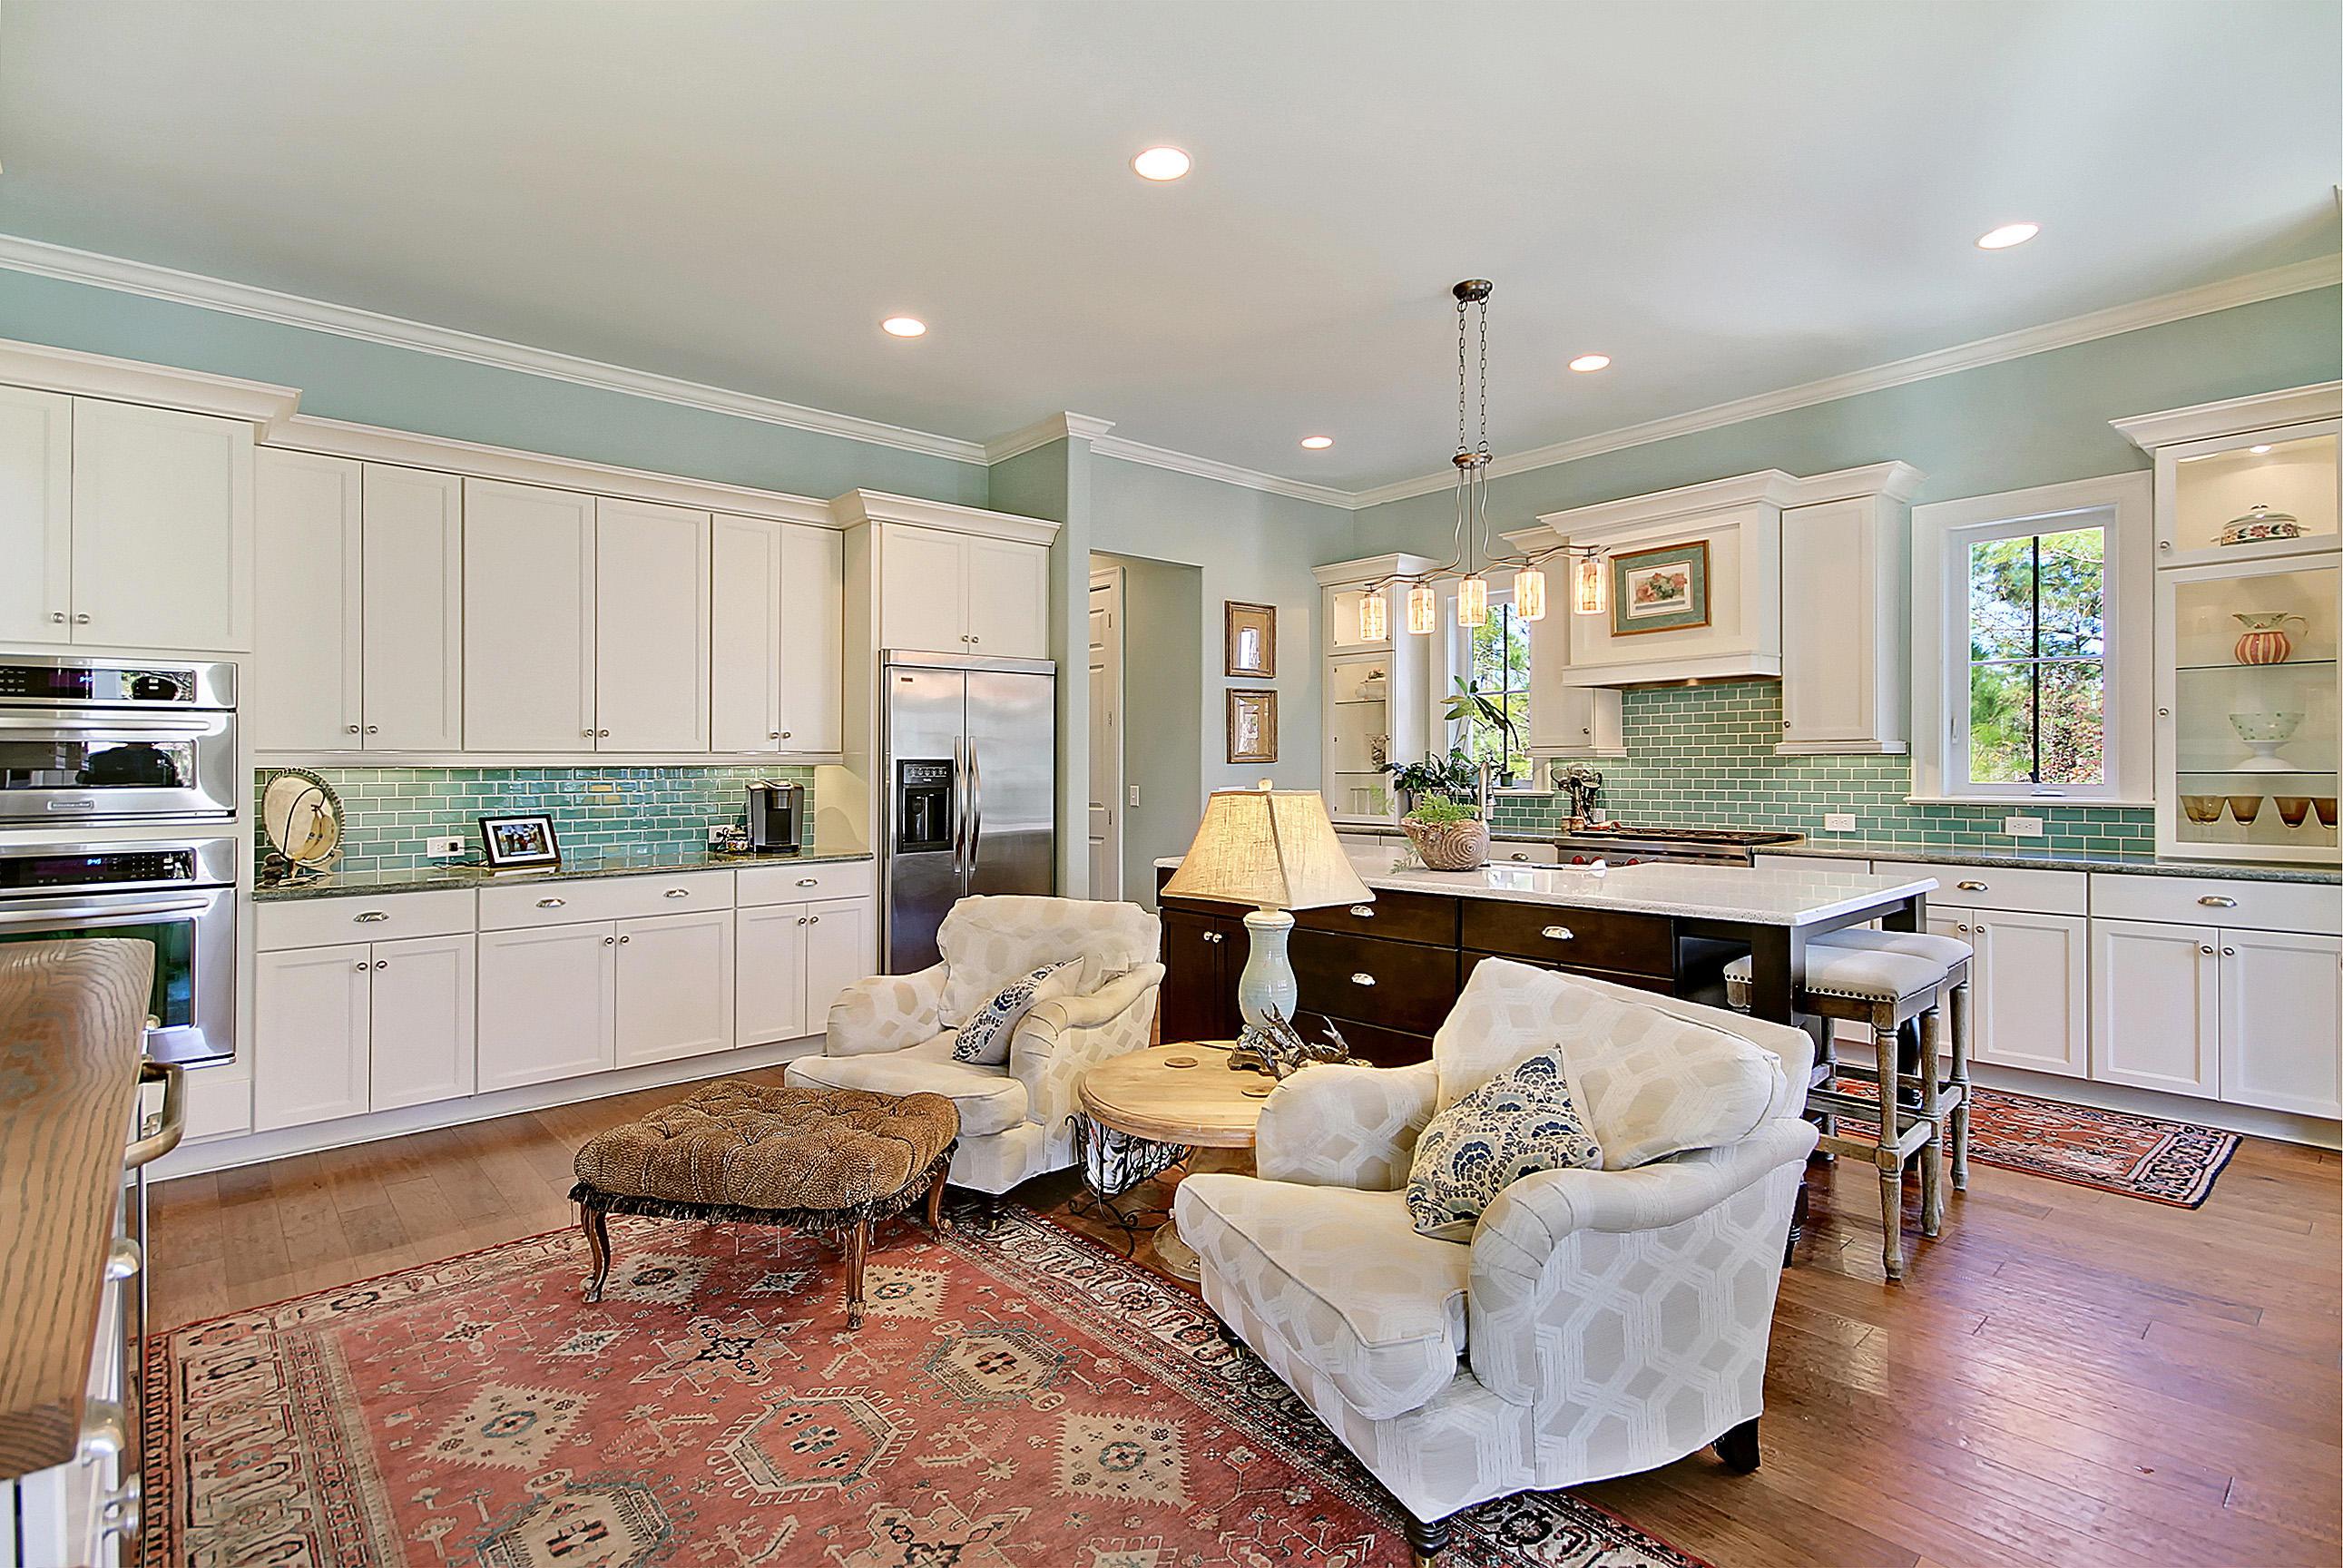 Rivertowne Country Club Homes For Sale - 2601 Kiln Creek, Mount Pleasant, SC - 6